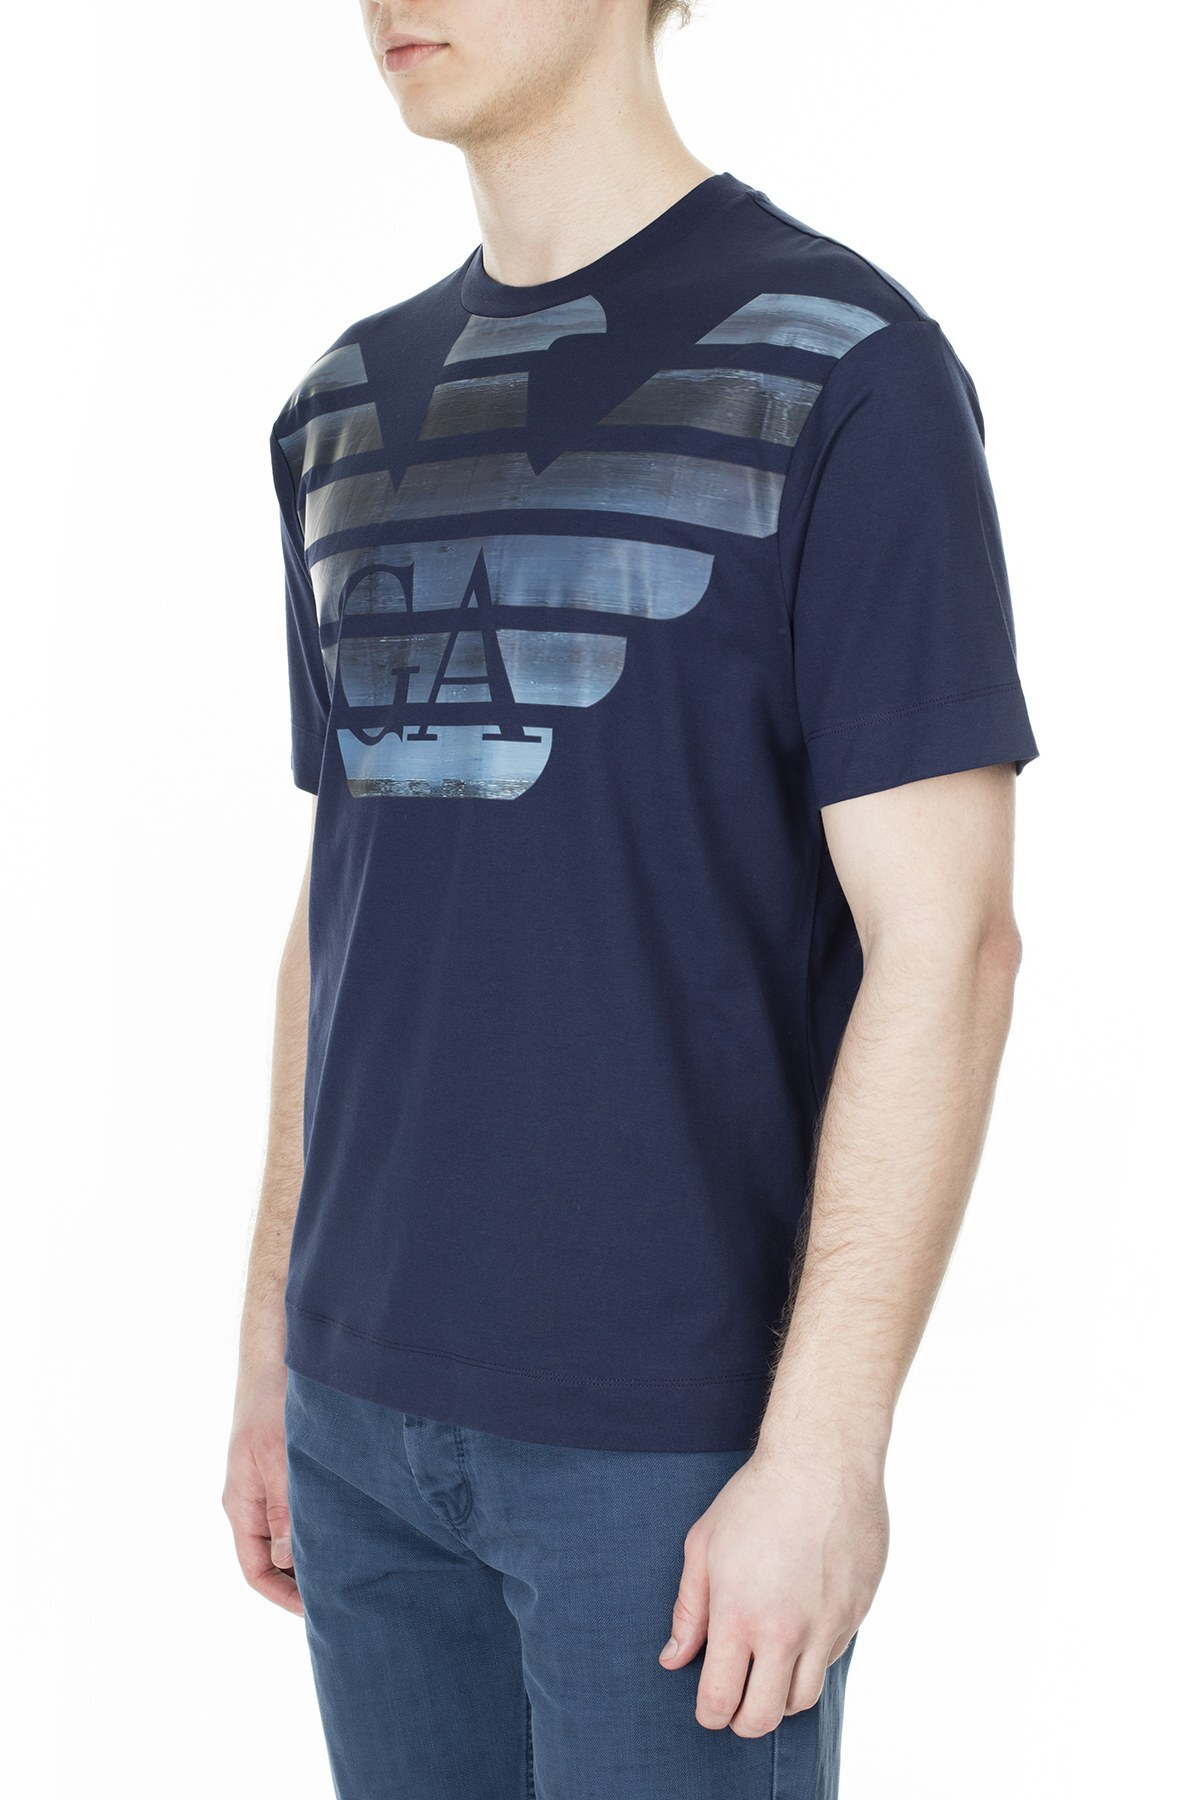 Emporio Armani Erkek T Shirt 3H1TM4 1JCQZ G919 LACİVERT